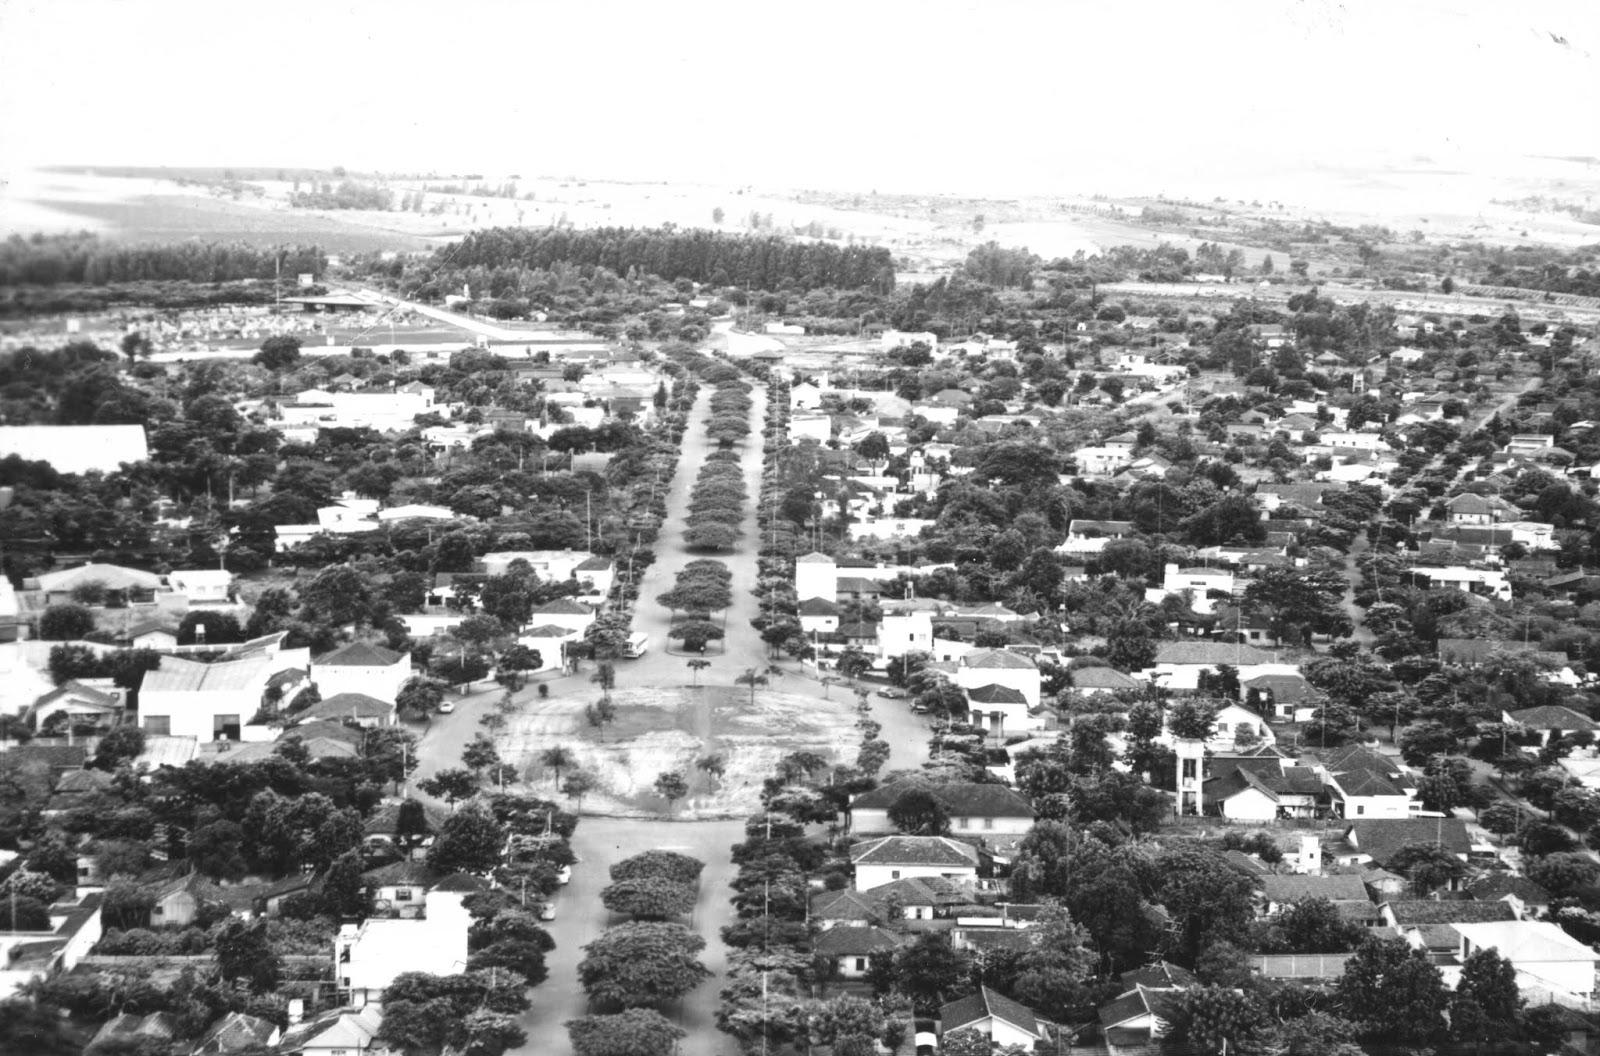 Avenida Cerro Azul - Década de 1970